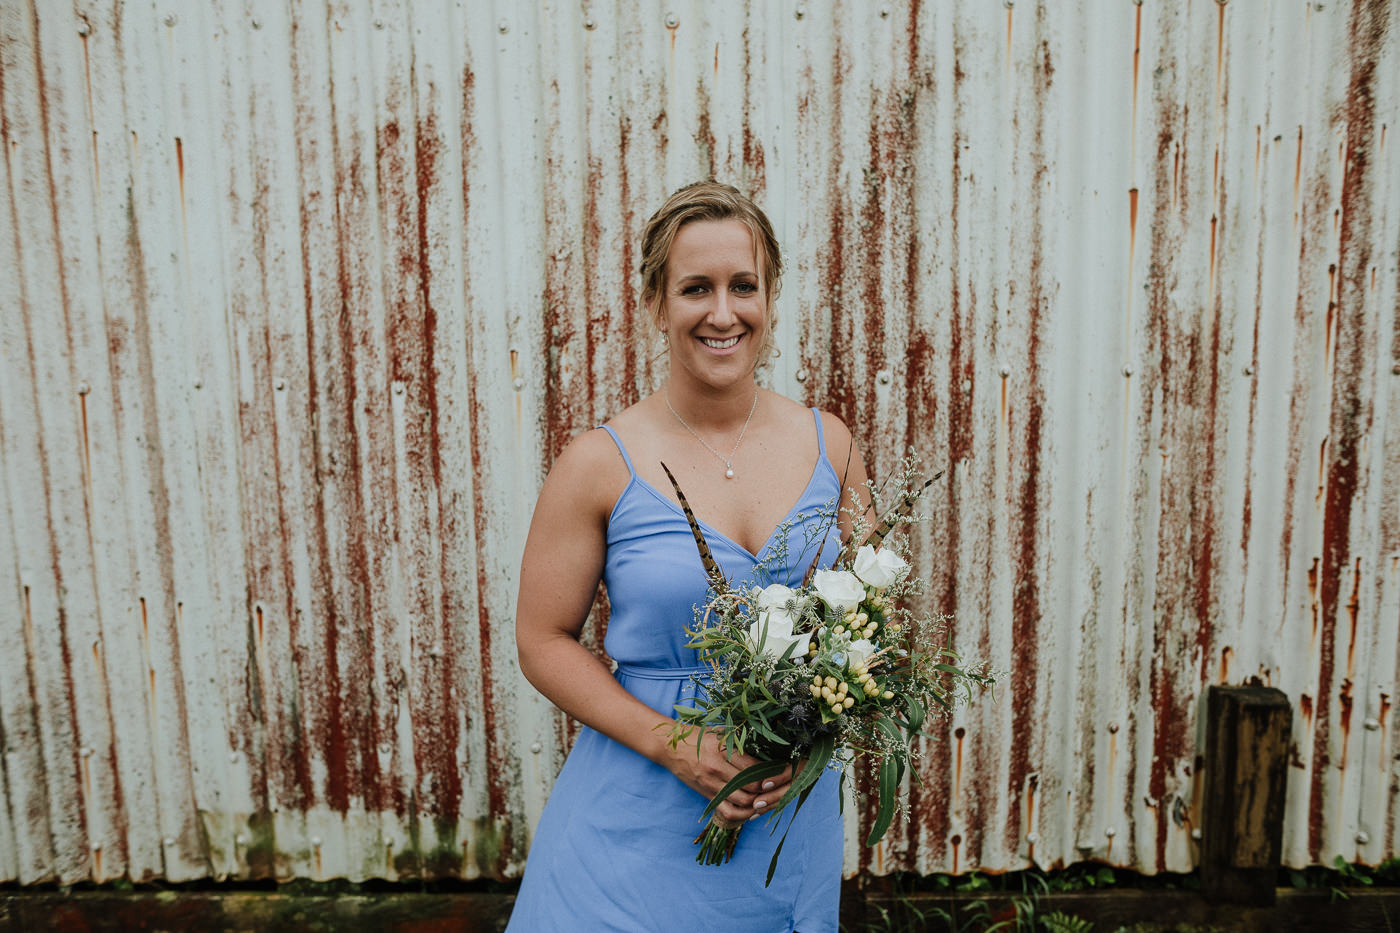 nz_wedding_photographer_gisborne-1108a.jpg